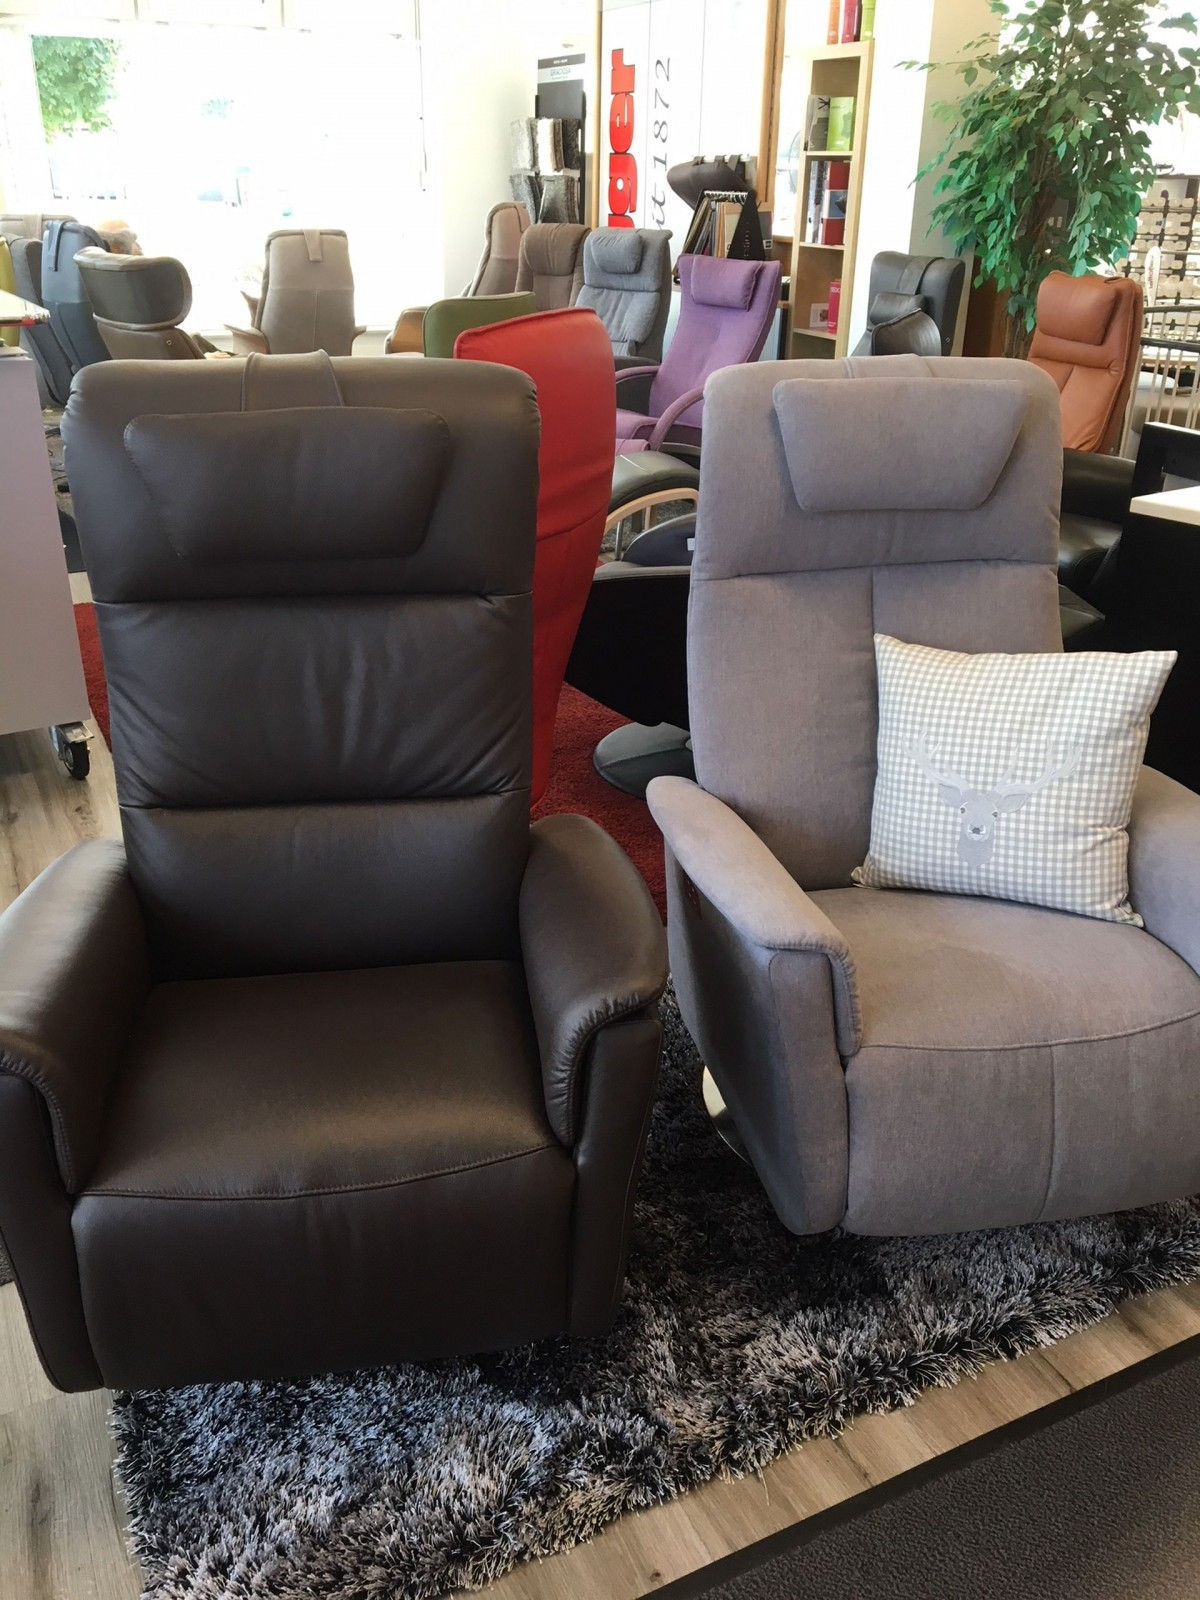 hjort knudsen betten segger. Black Bedroom Furniture Sets. Home Design Ideas